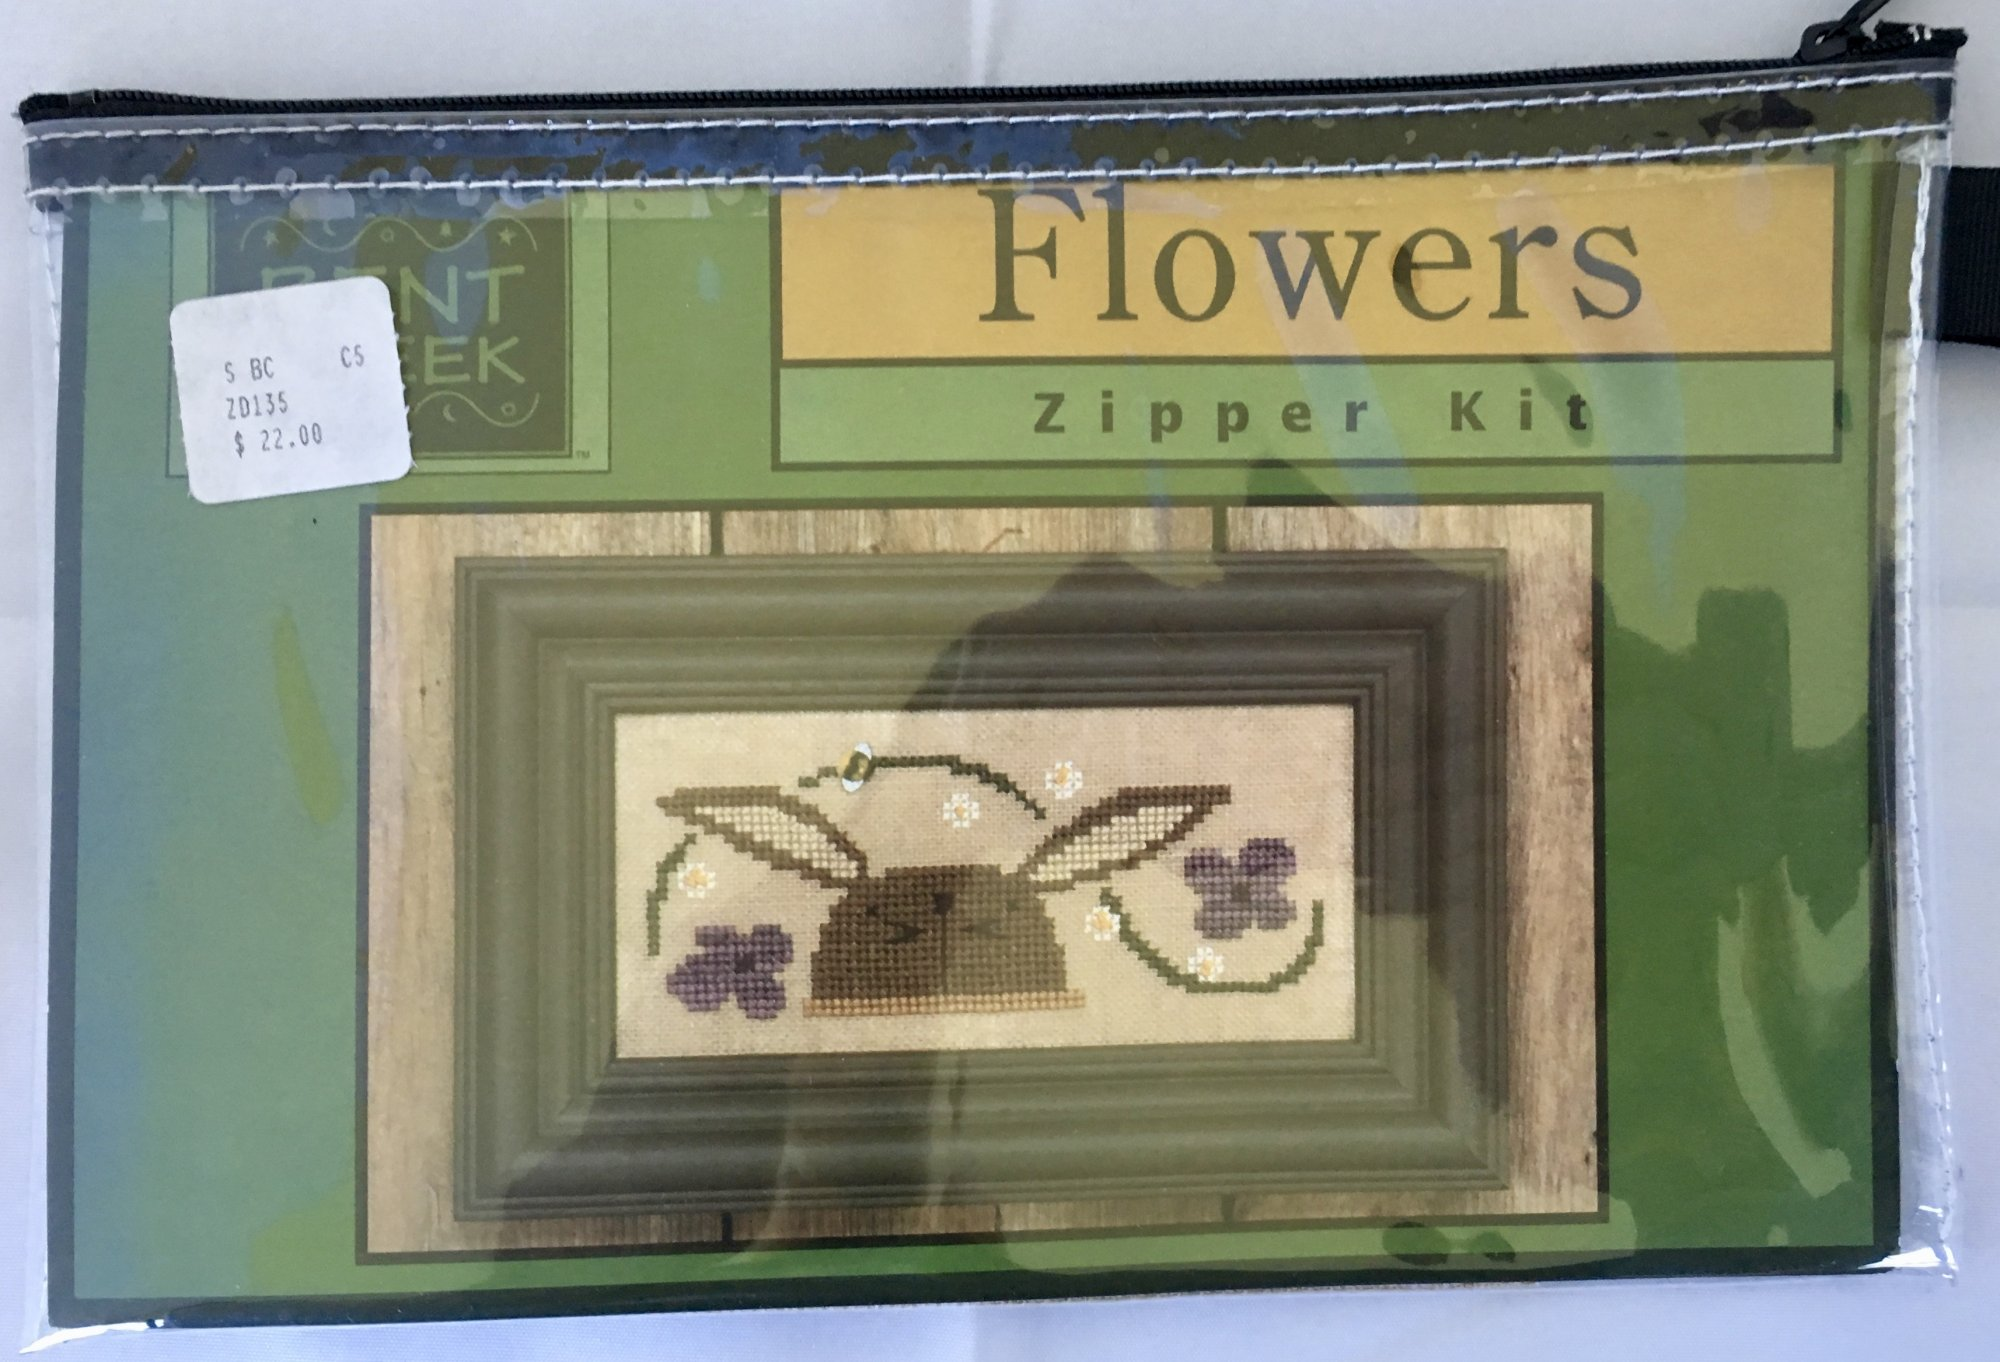 Bent Creek: Flowers Zipper Kit